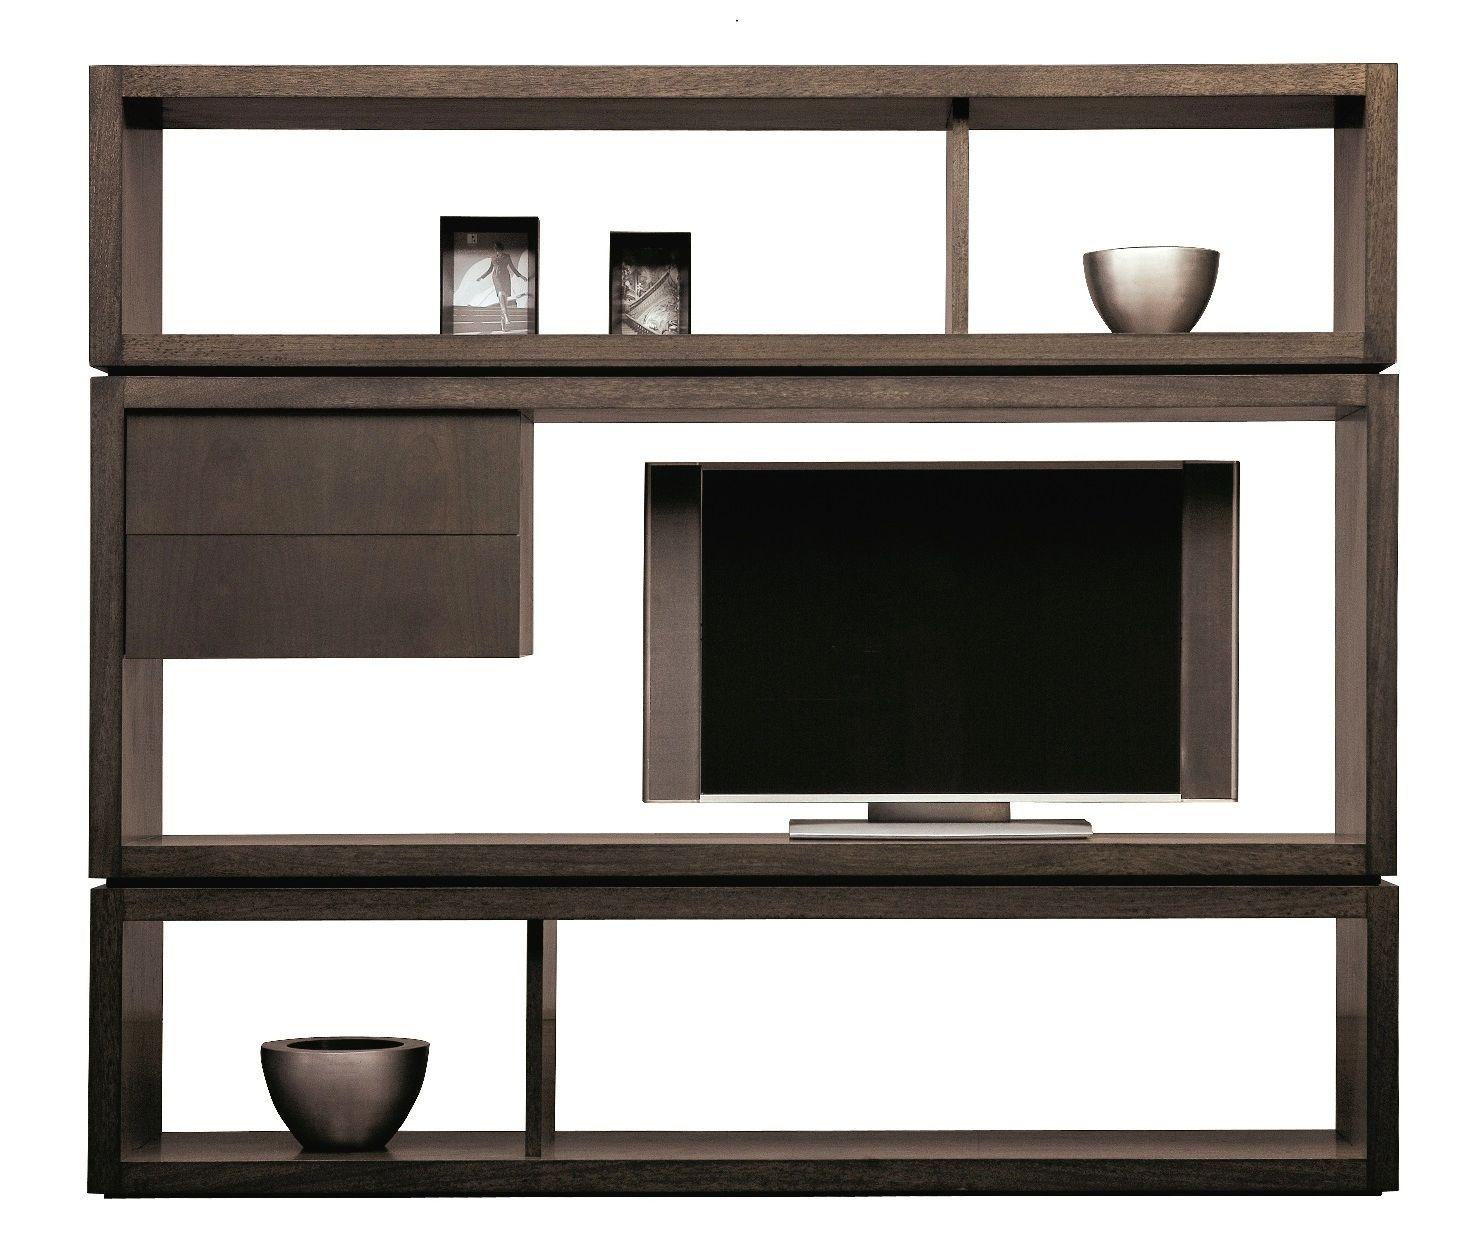 Mueble de televisin modular